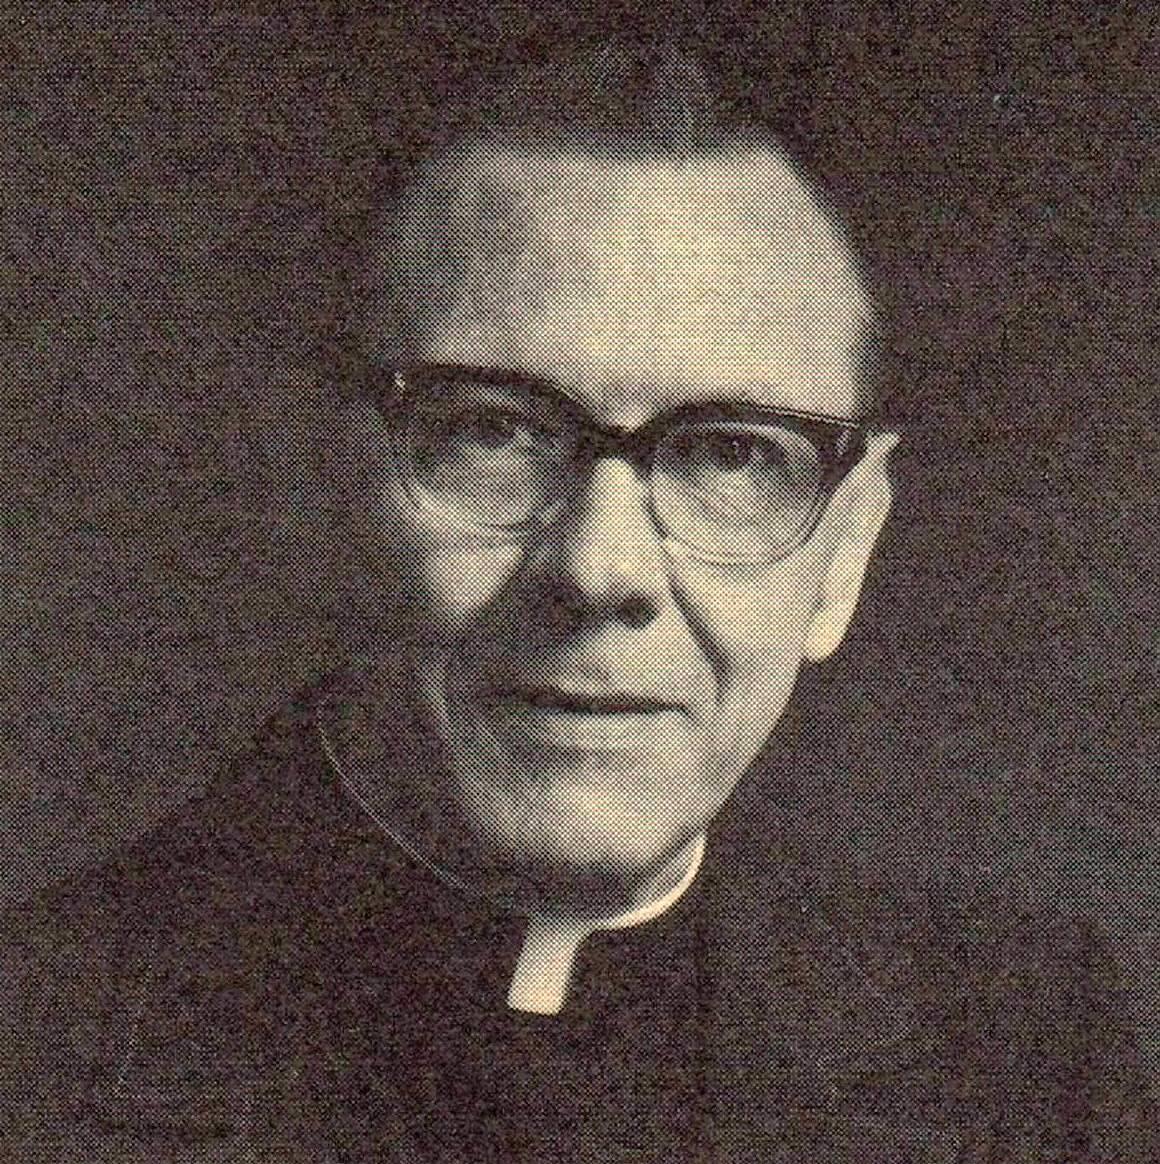 Rev. Edmund Kestel,Assistant, 1977-1980